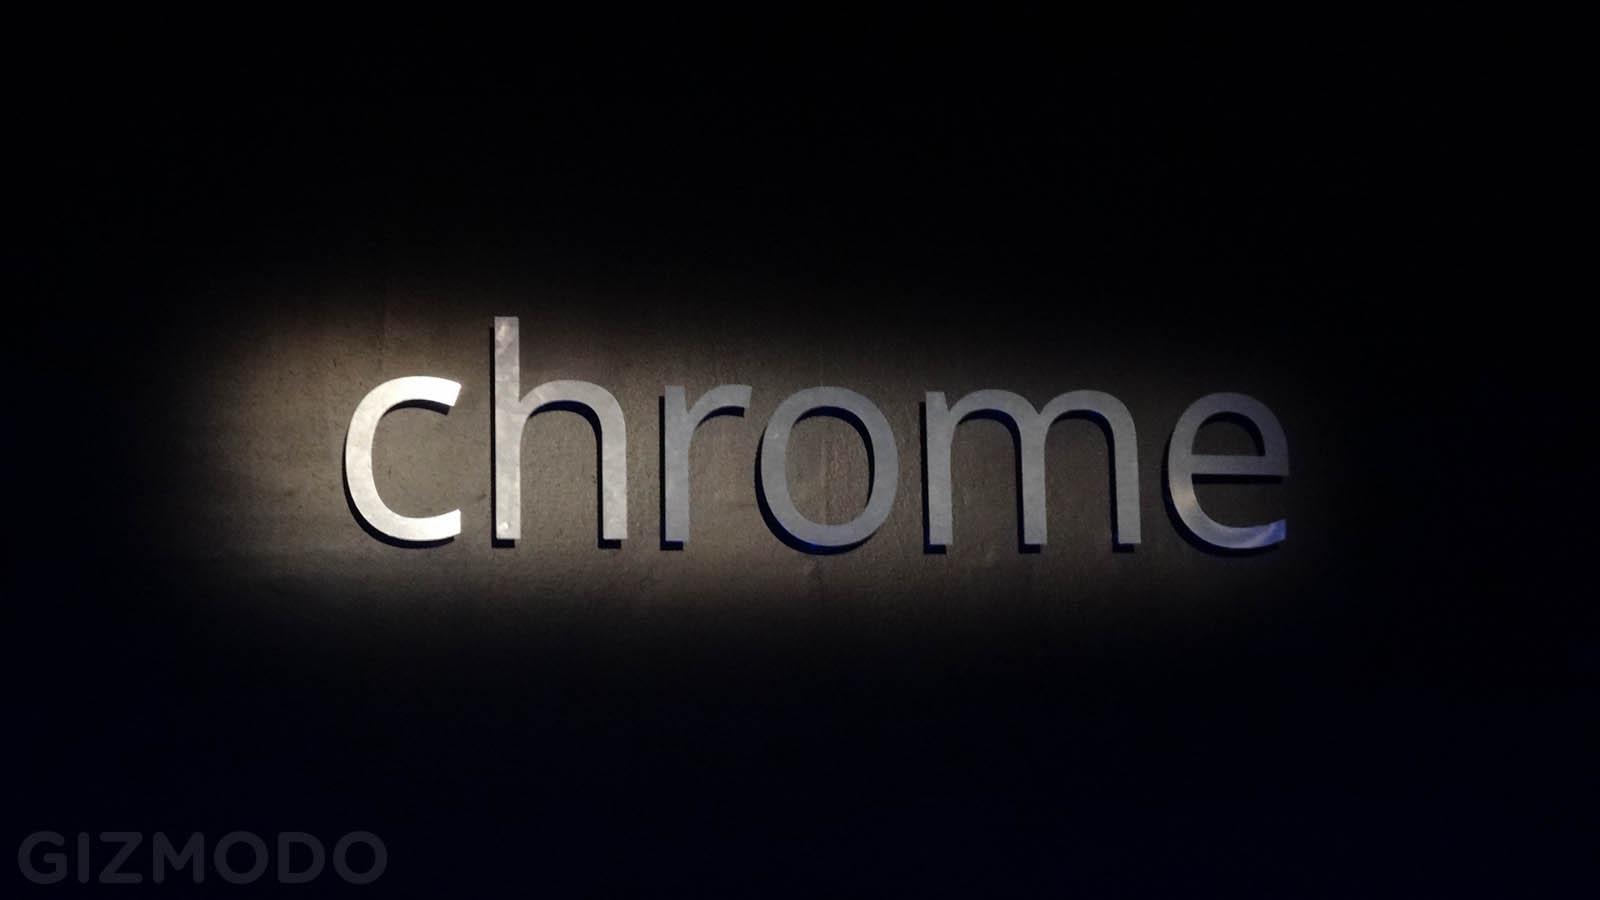 Chromebook Wallpapers Hd Chromebook pixel googles 1600x900